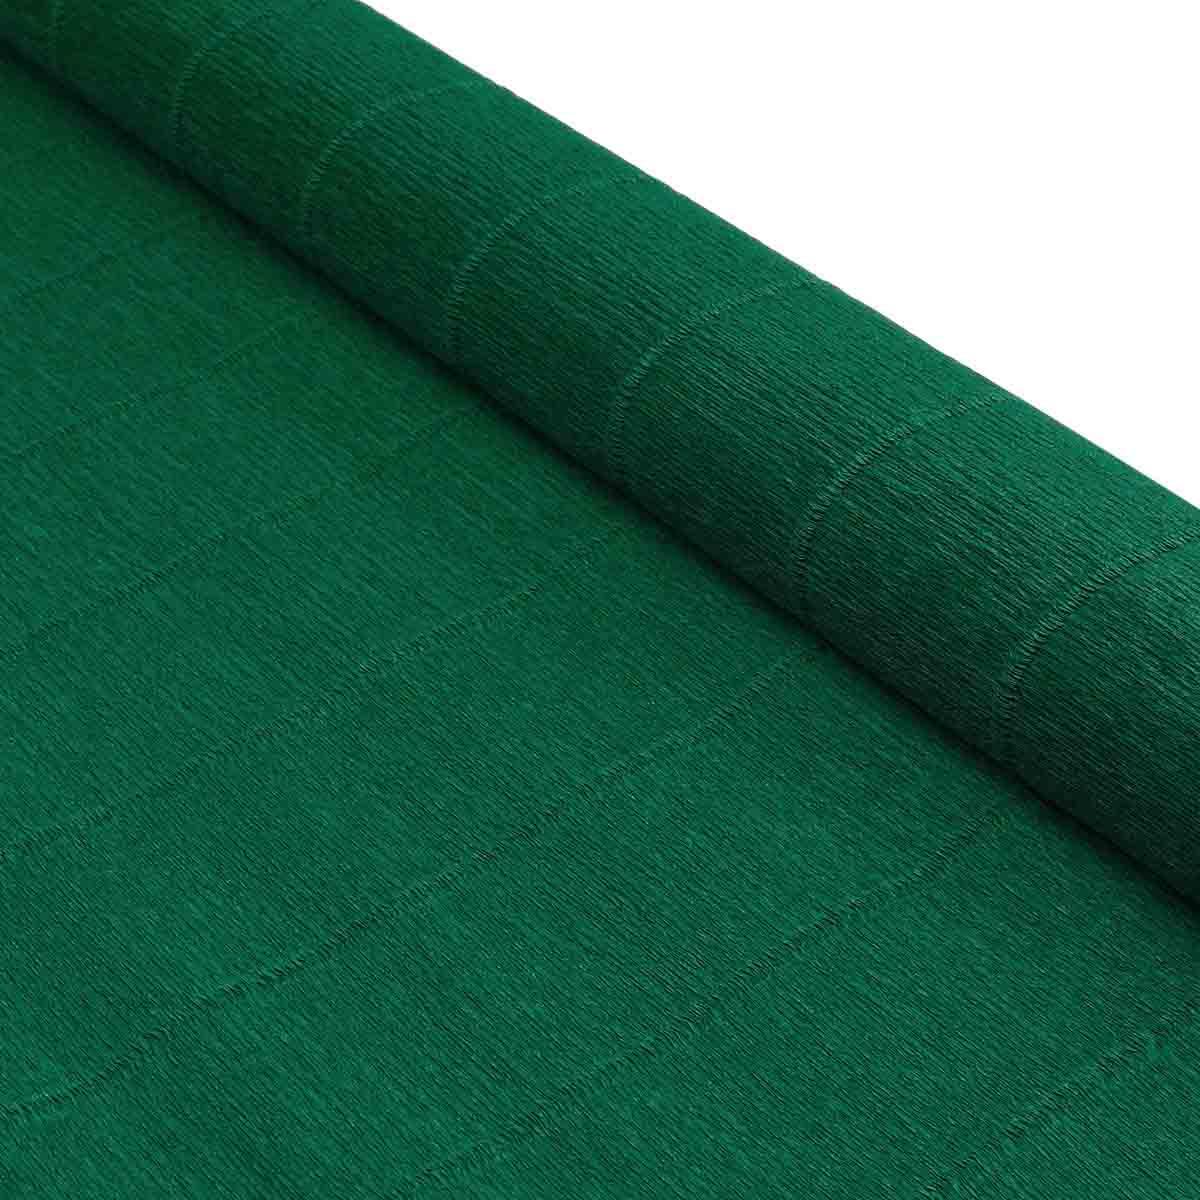 58870 Бумага гофрированная простая, 50см*2,5м 180гр 561 хвойно-зеленая